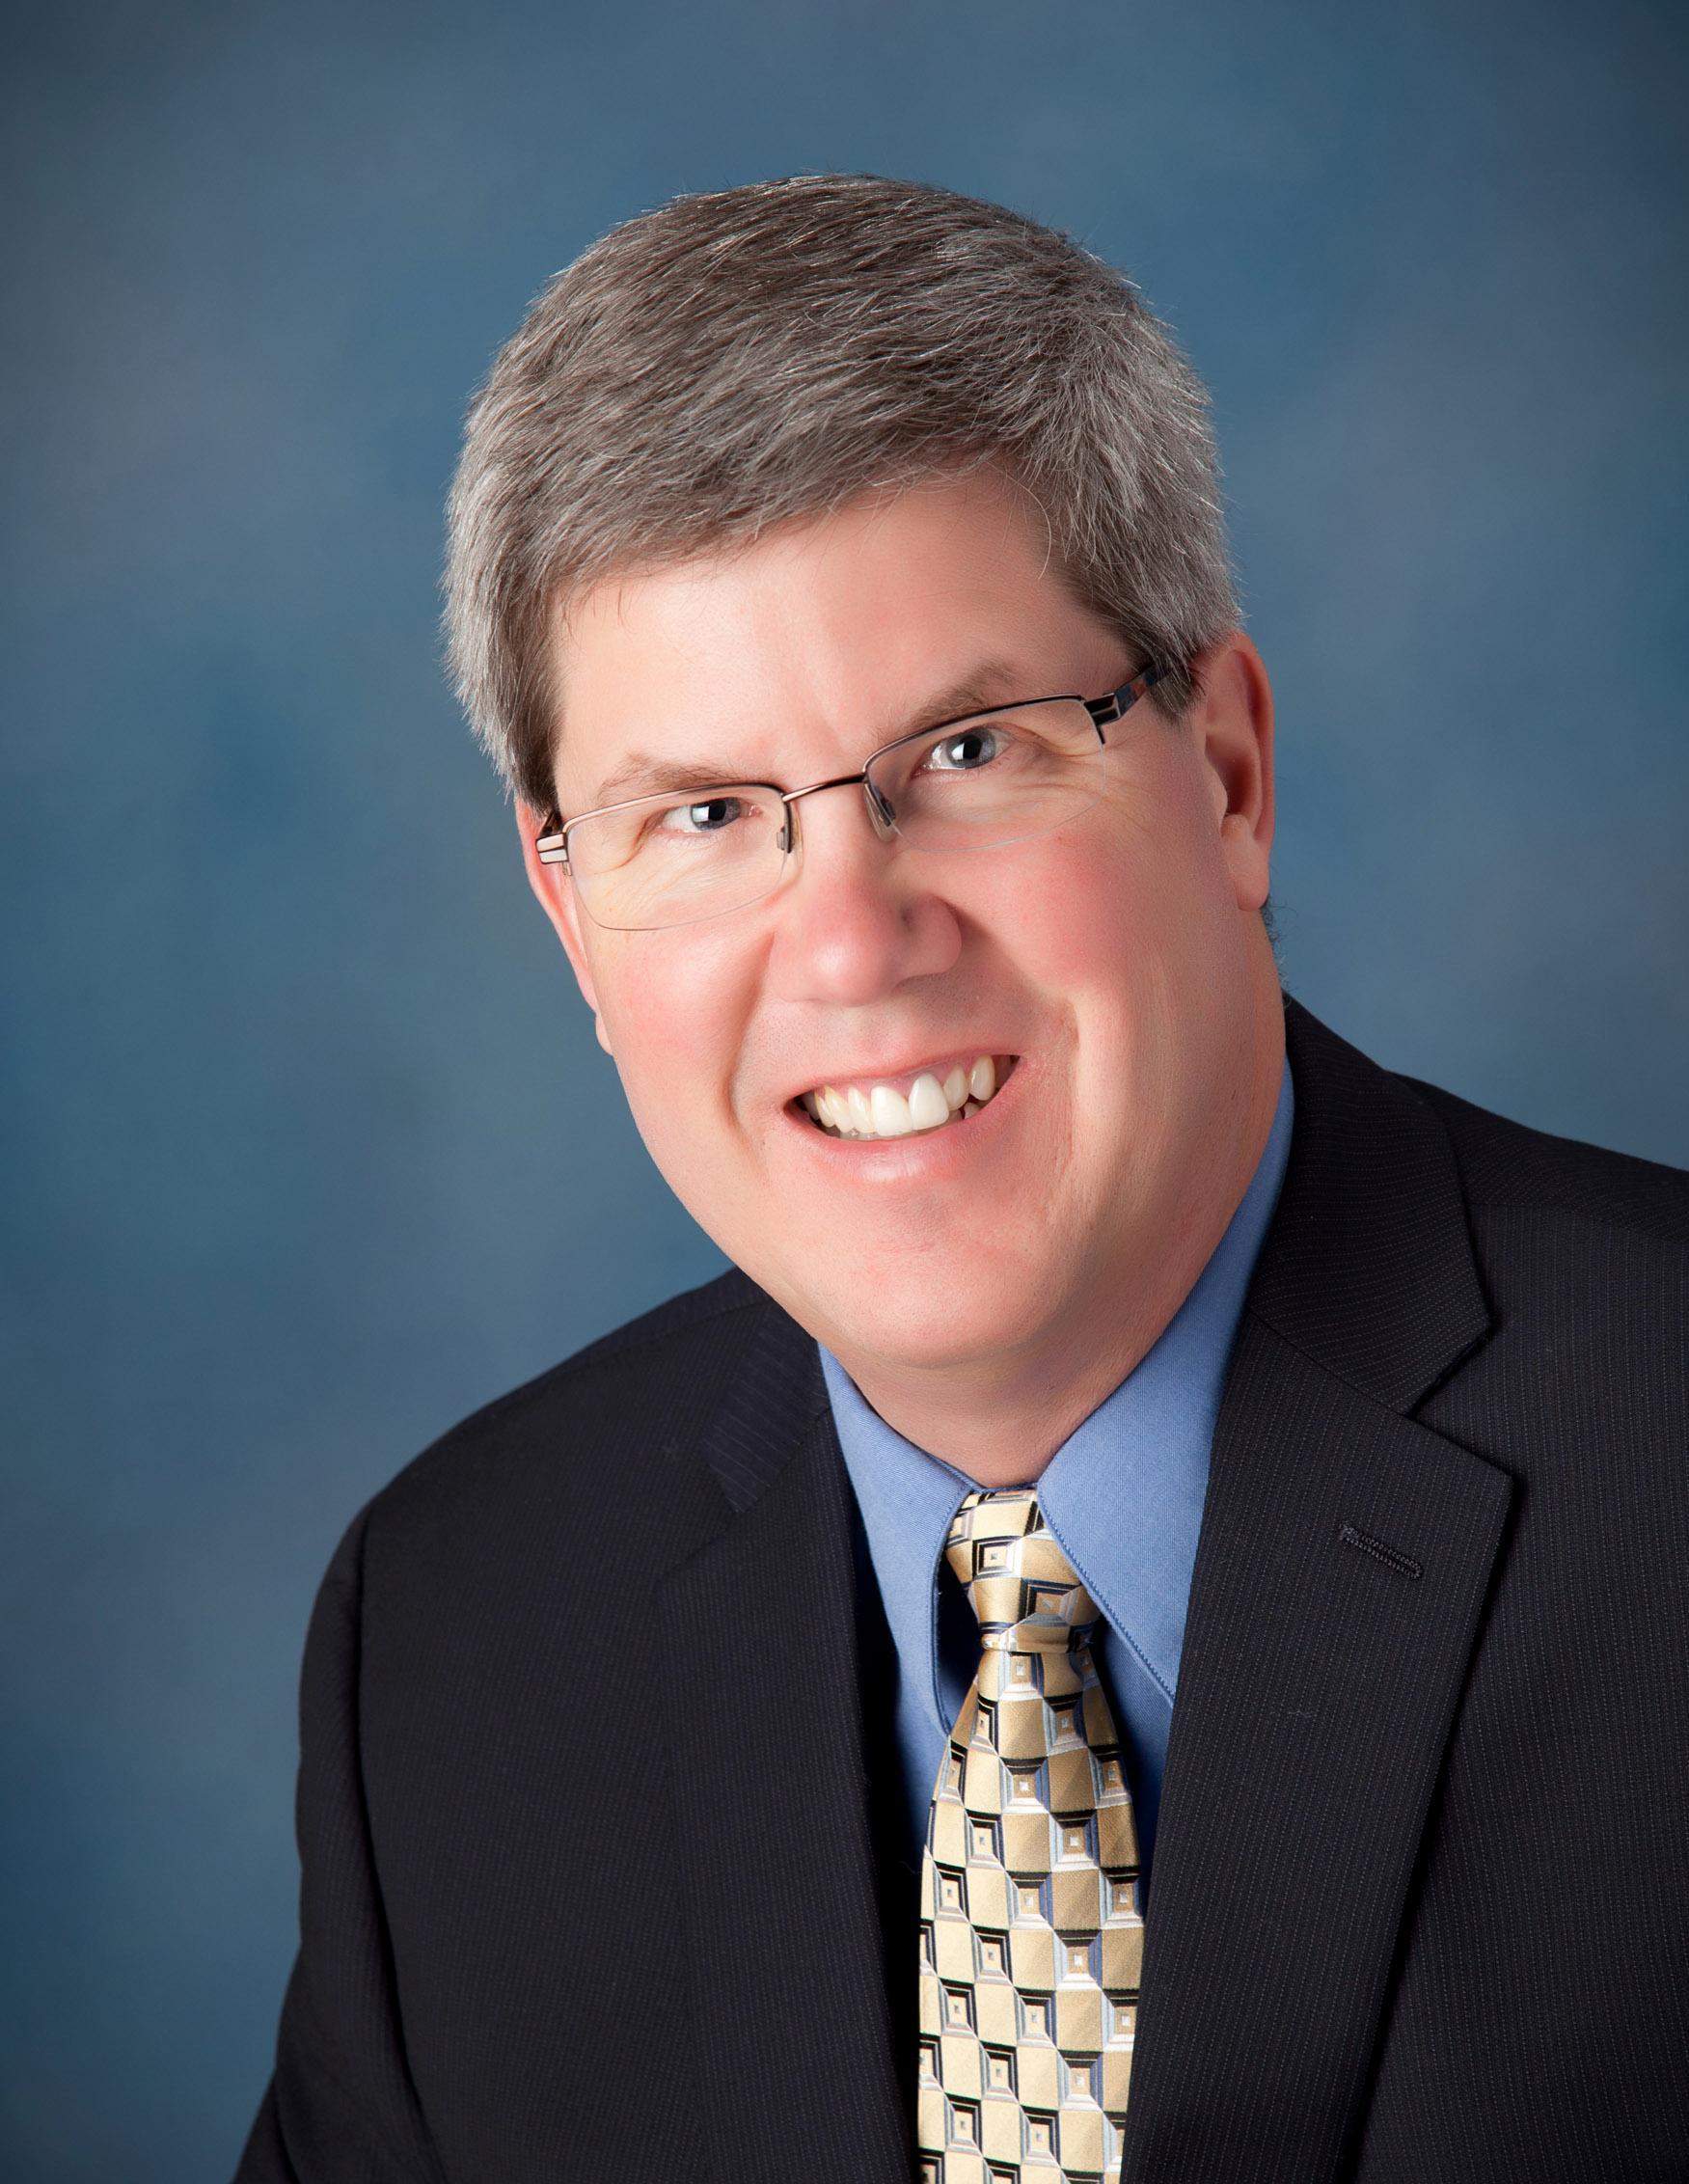 SCOTT SCHEER Financial Advisor